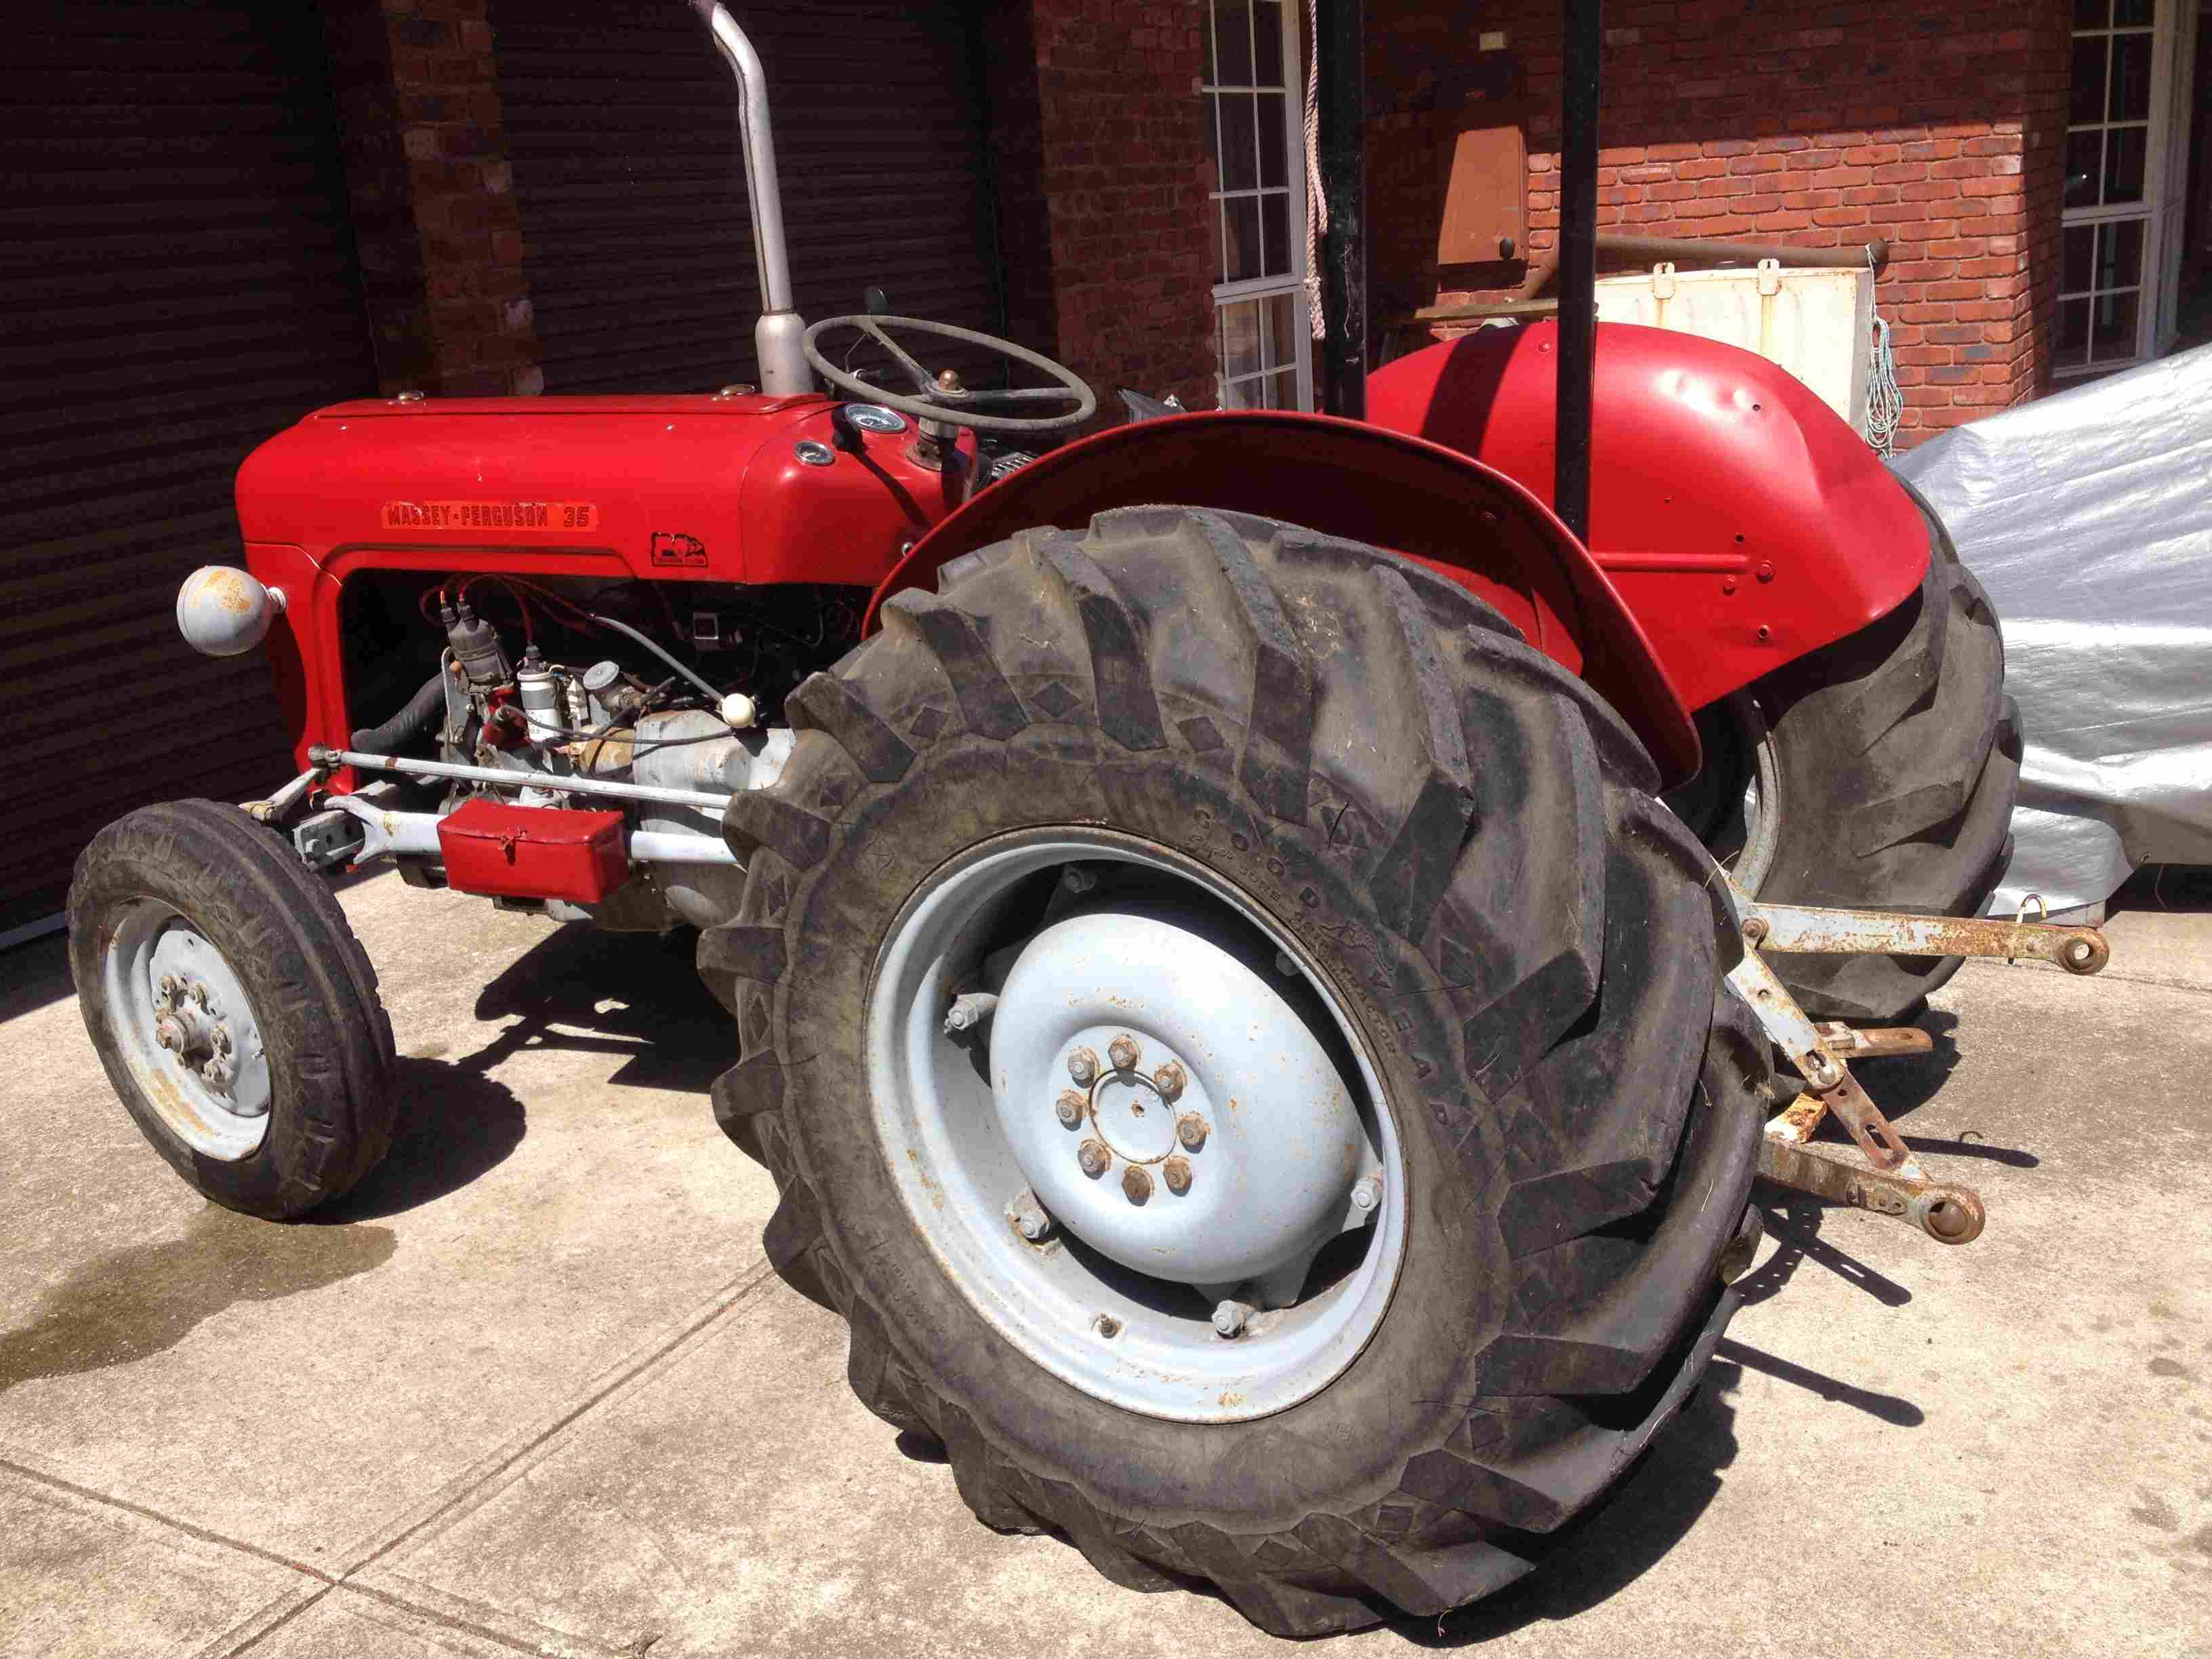 massey ferguson 35 tractor machinery equipment tractors. Black Bedroom Furniture Sets. Home Design Ideas